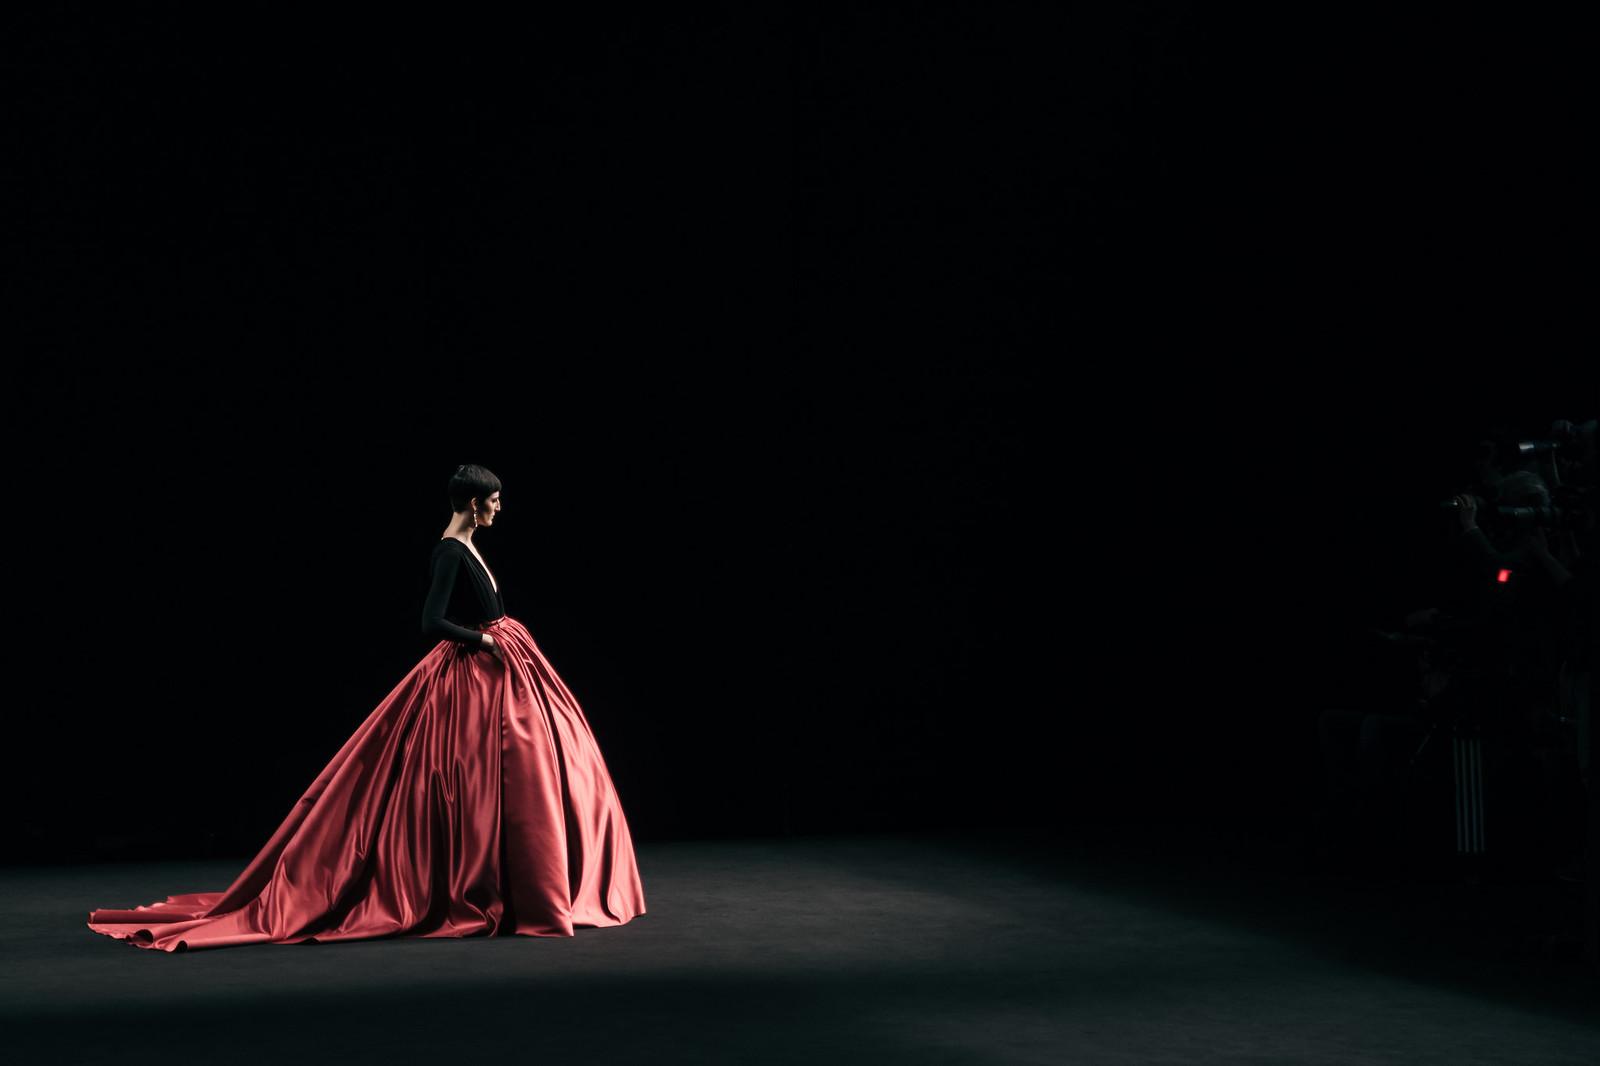 Jessie Chanes - Seams for a desire - 080 Bacelona Fashion #080bcnfasion -65